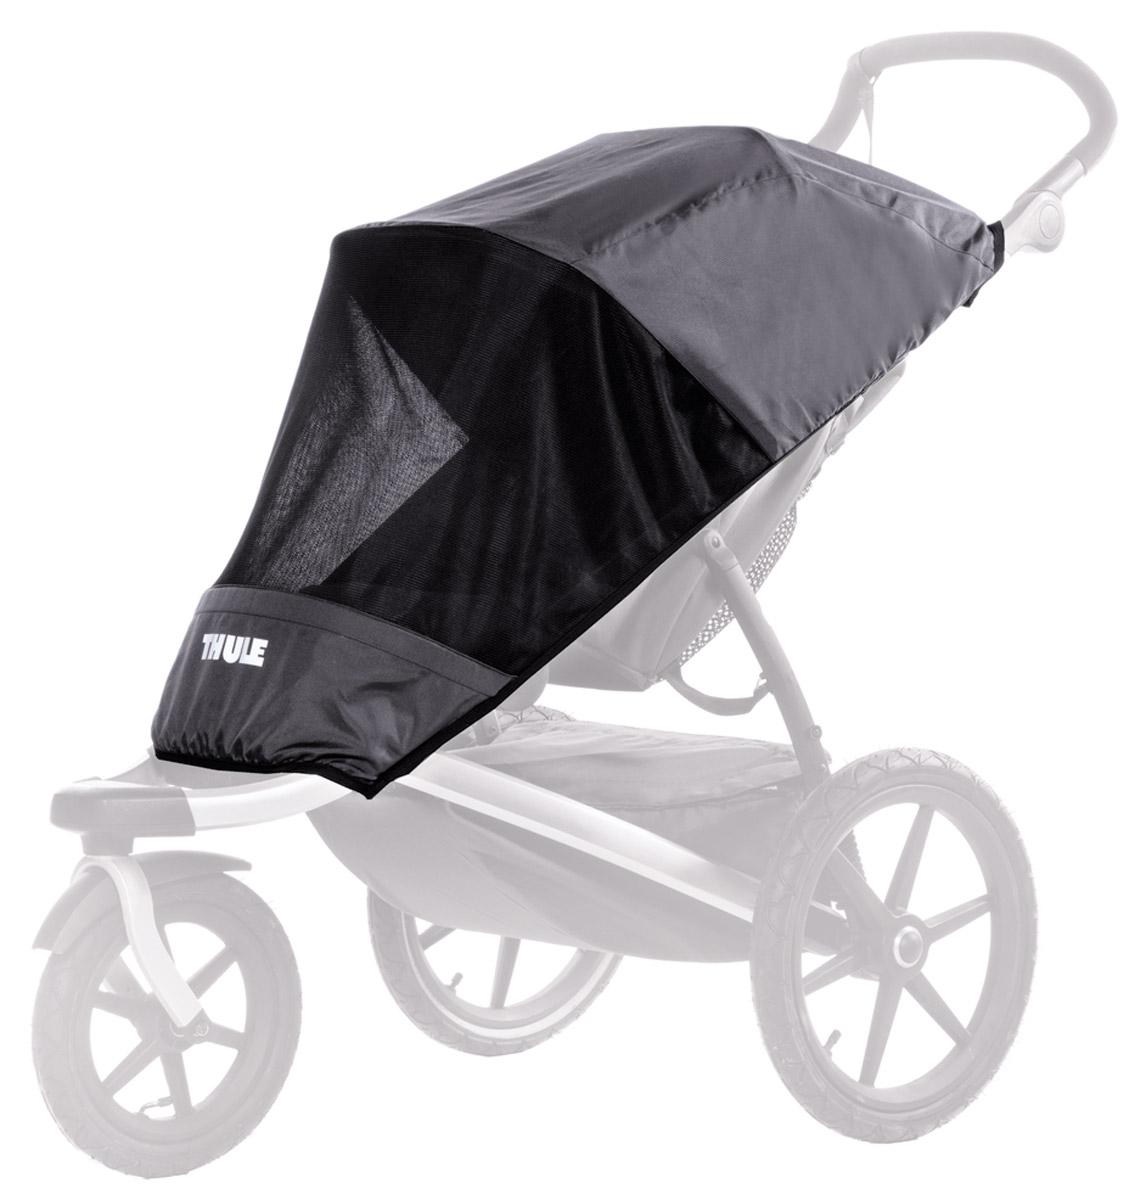 Thule Грязезащитный чехол Glide Mesh cover чехол дождевик для большой сумки thule large pannier rain cover 100041